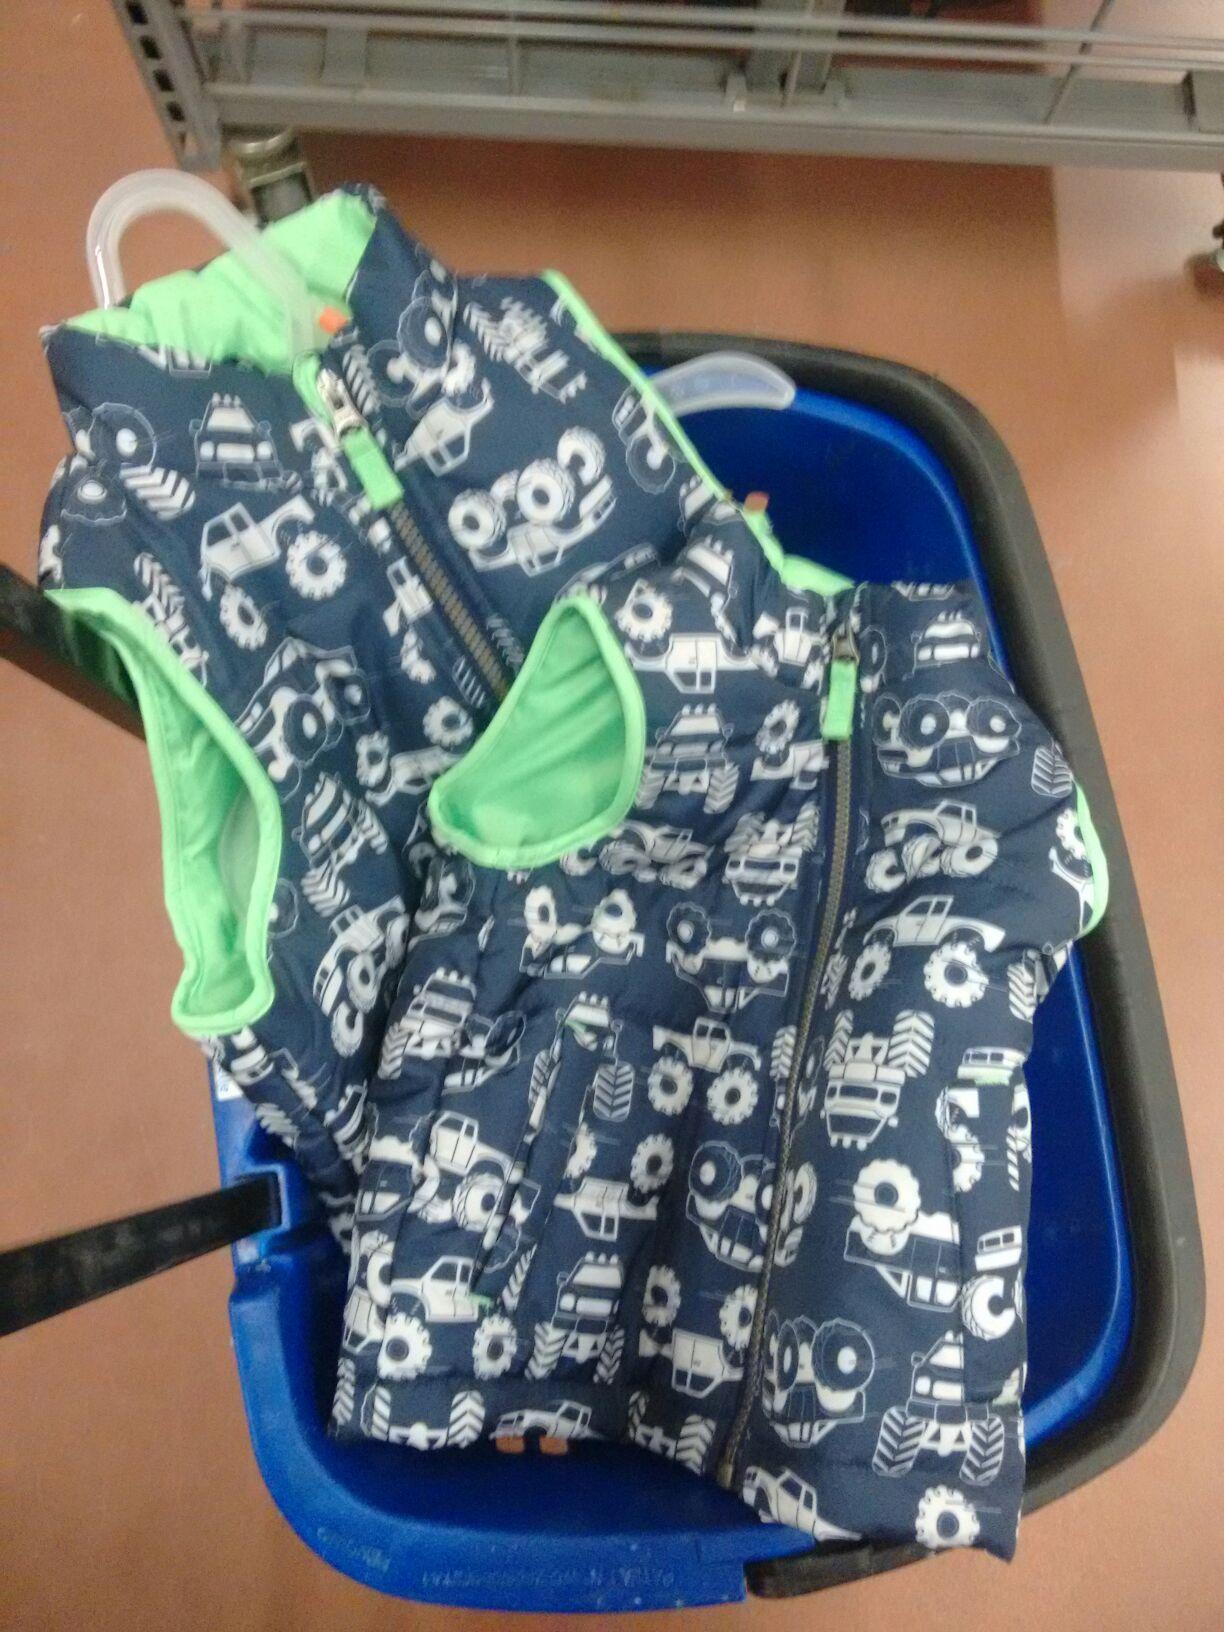 Walmart: Chaleco para niños a $60.01